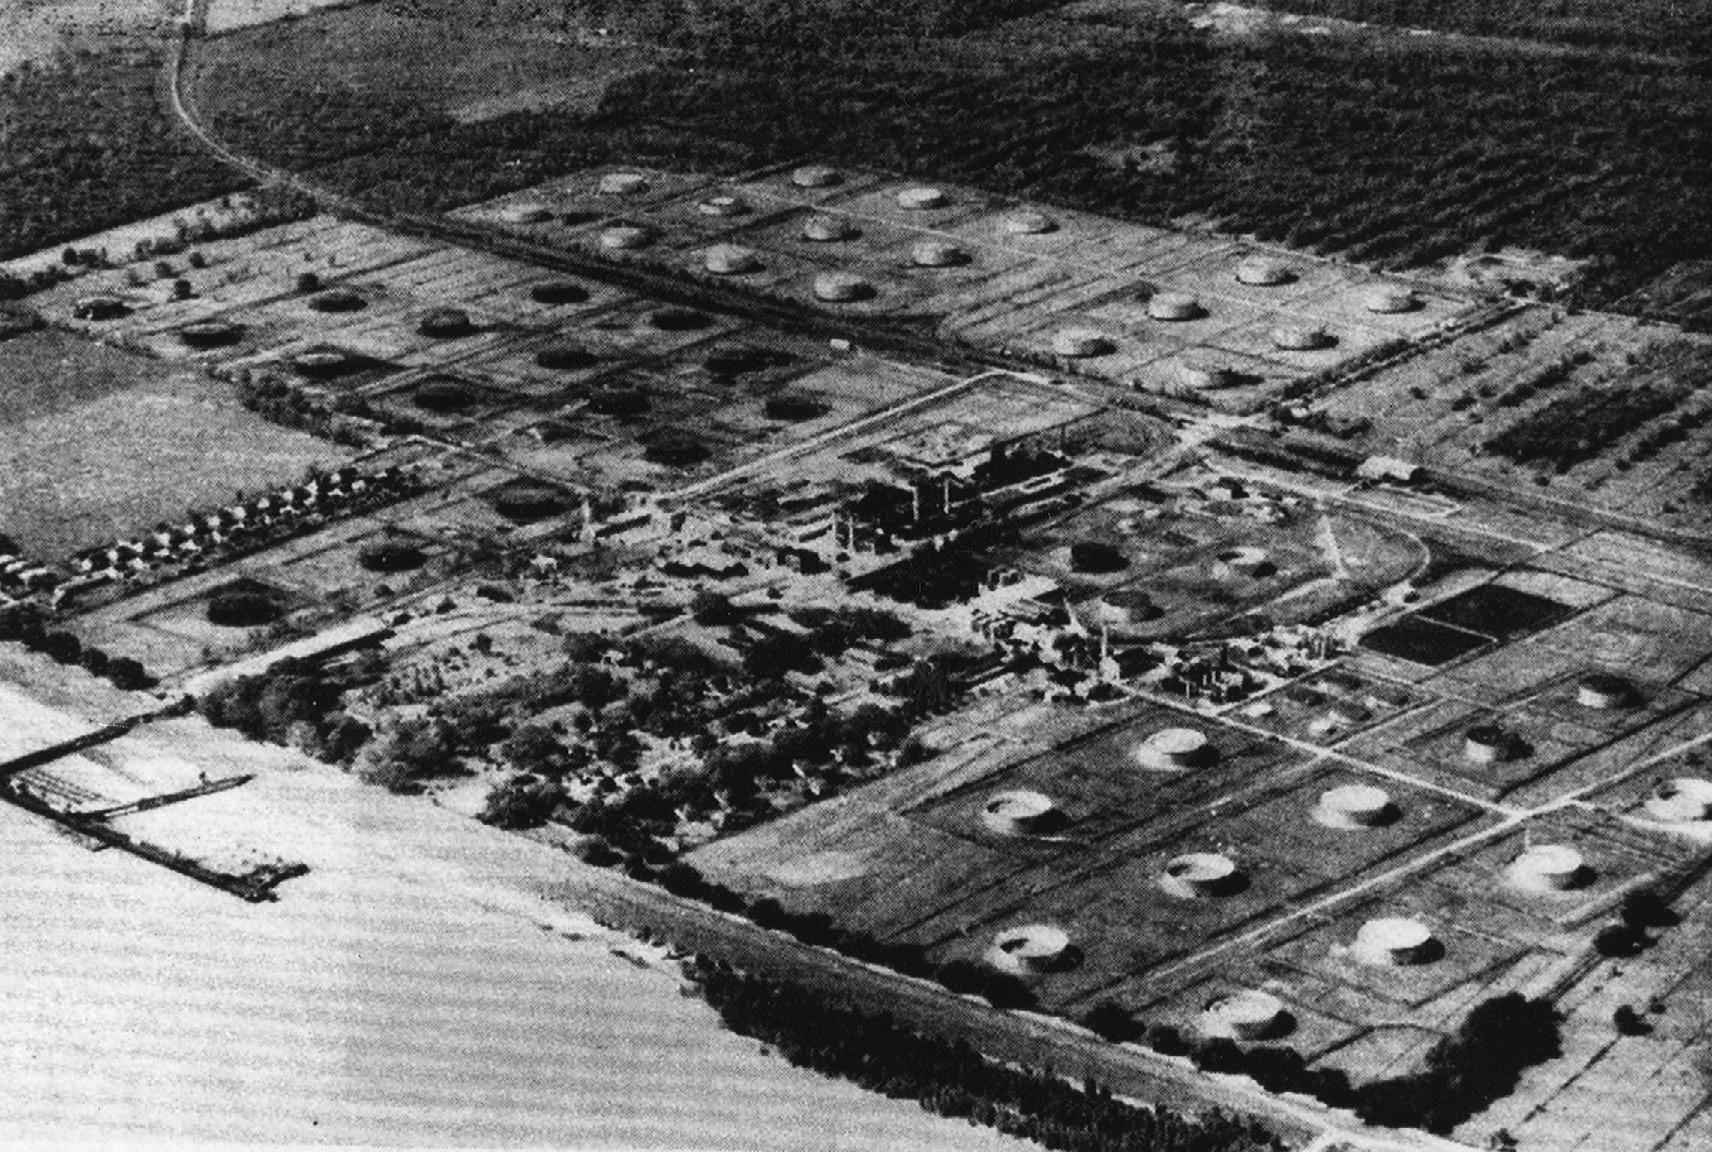 Pan American / Amoco Refinery